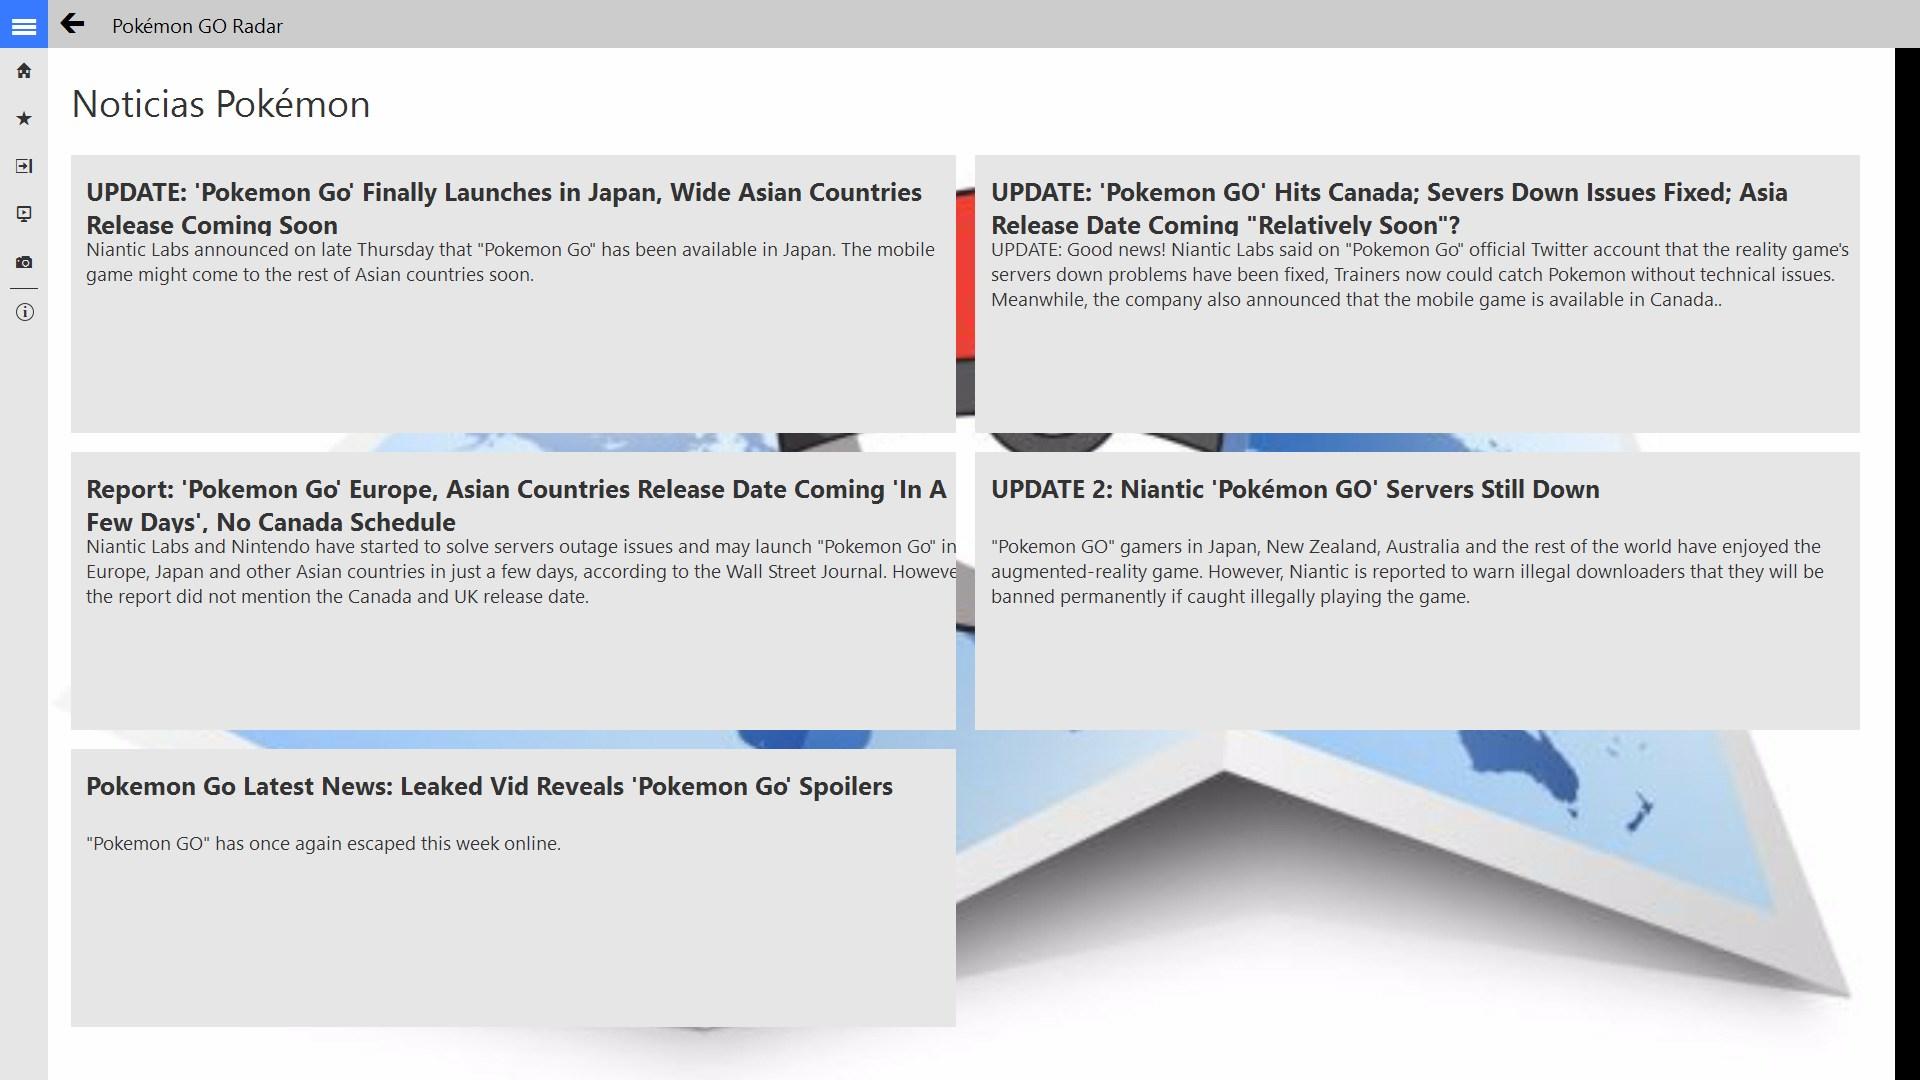 Pokémon GO Radar | FREE Windows Phone app market